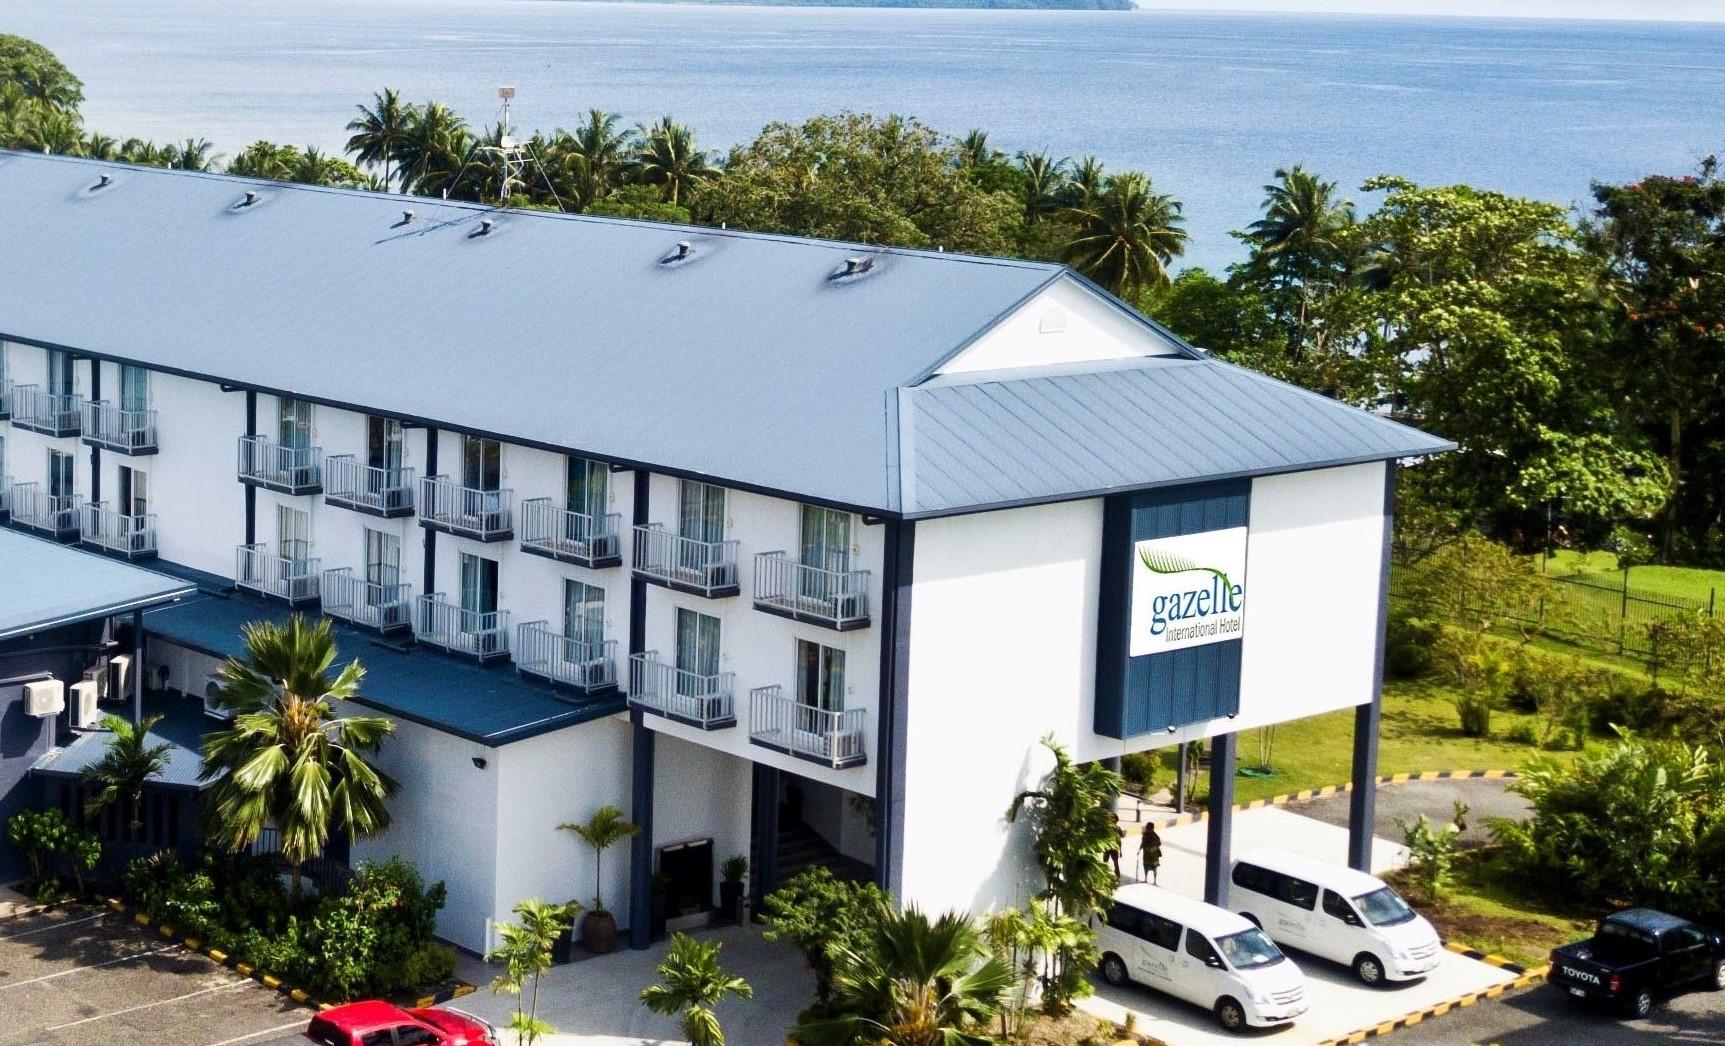 Air Niugini Destinations Loyalty Program Partners With Gazelle International Hotel